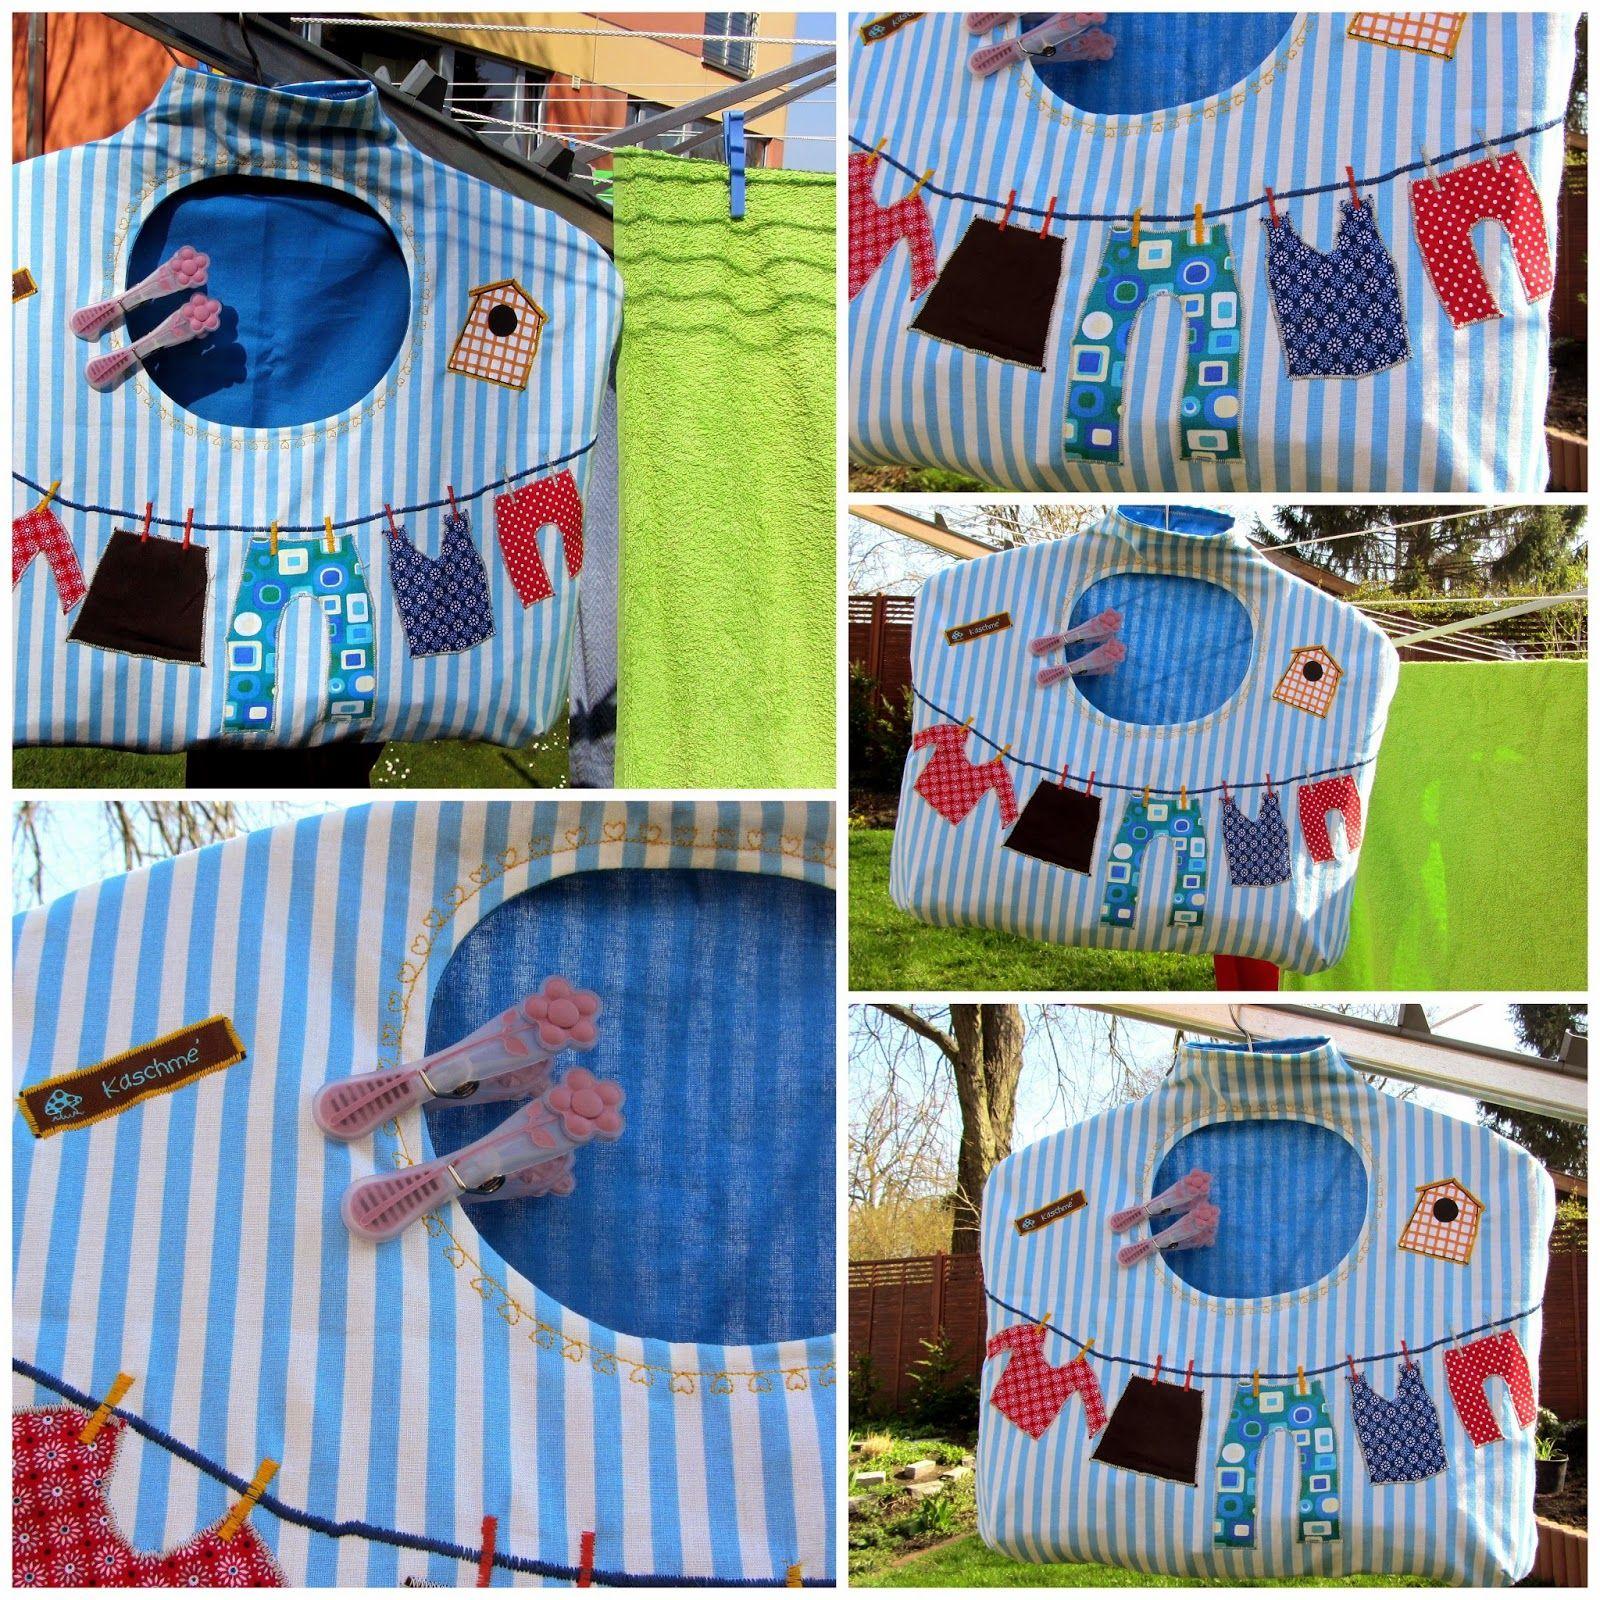 Wäscheklammerbeutel | швейные дела | Pinterest | Peg bag and Taschen